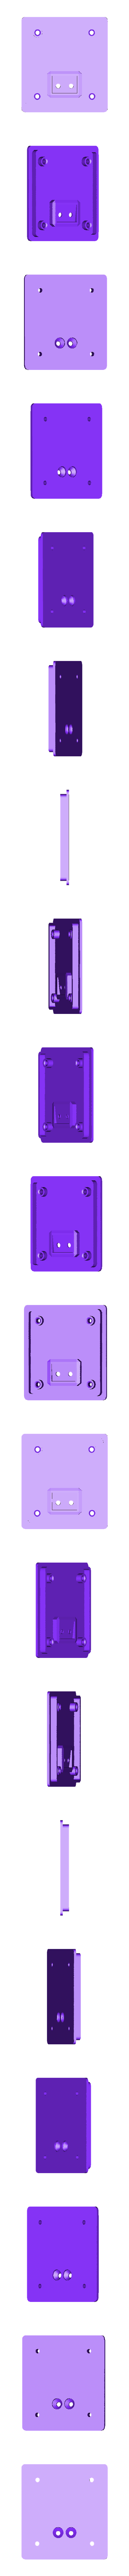 Base_0.25res_20.stl Download free STL file Volvo V40 Trunk Hook • Design to 3D print, stibo